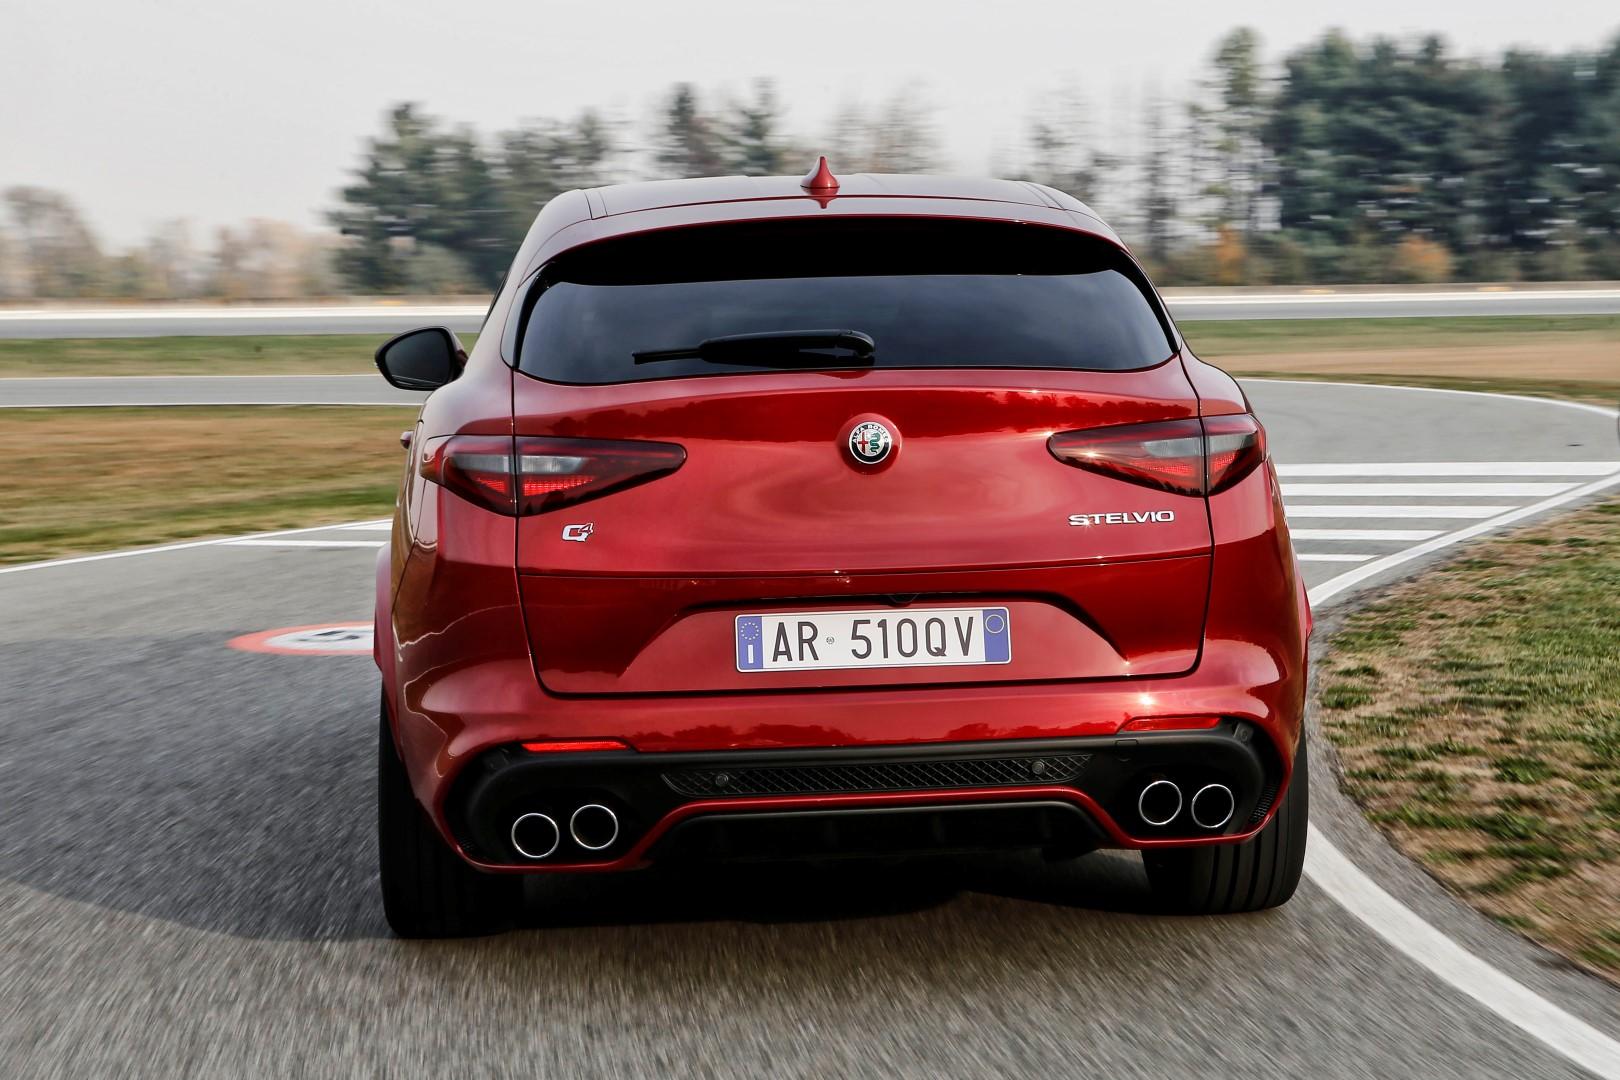 Toyota Supra 2018 Prezzo >> Fotospecial: Alfa Romeo Stelvio Quadrifoglio - Dagelijksauto.nl